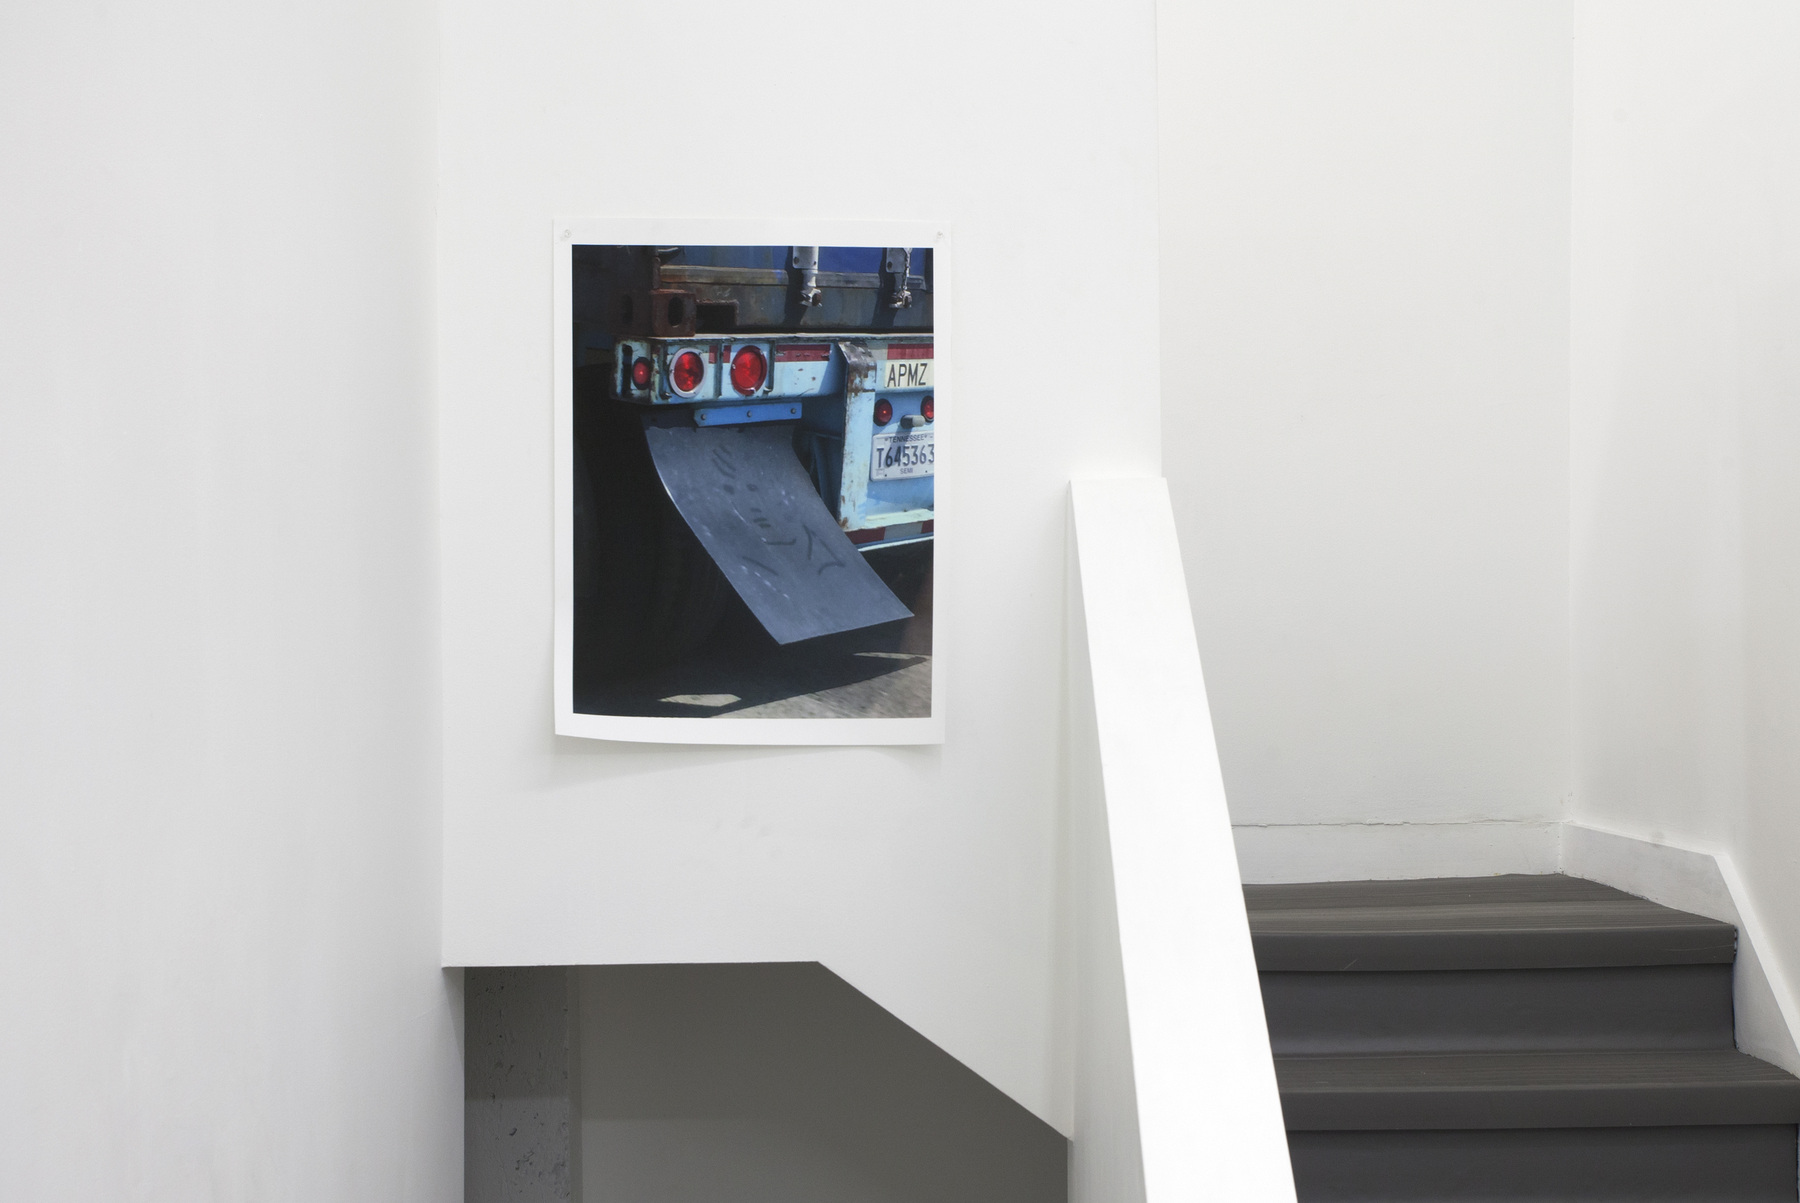 CC_15_Fry_Guy_Davida_Nemeroff_Sonny_CC_Installation